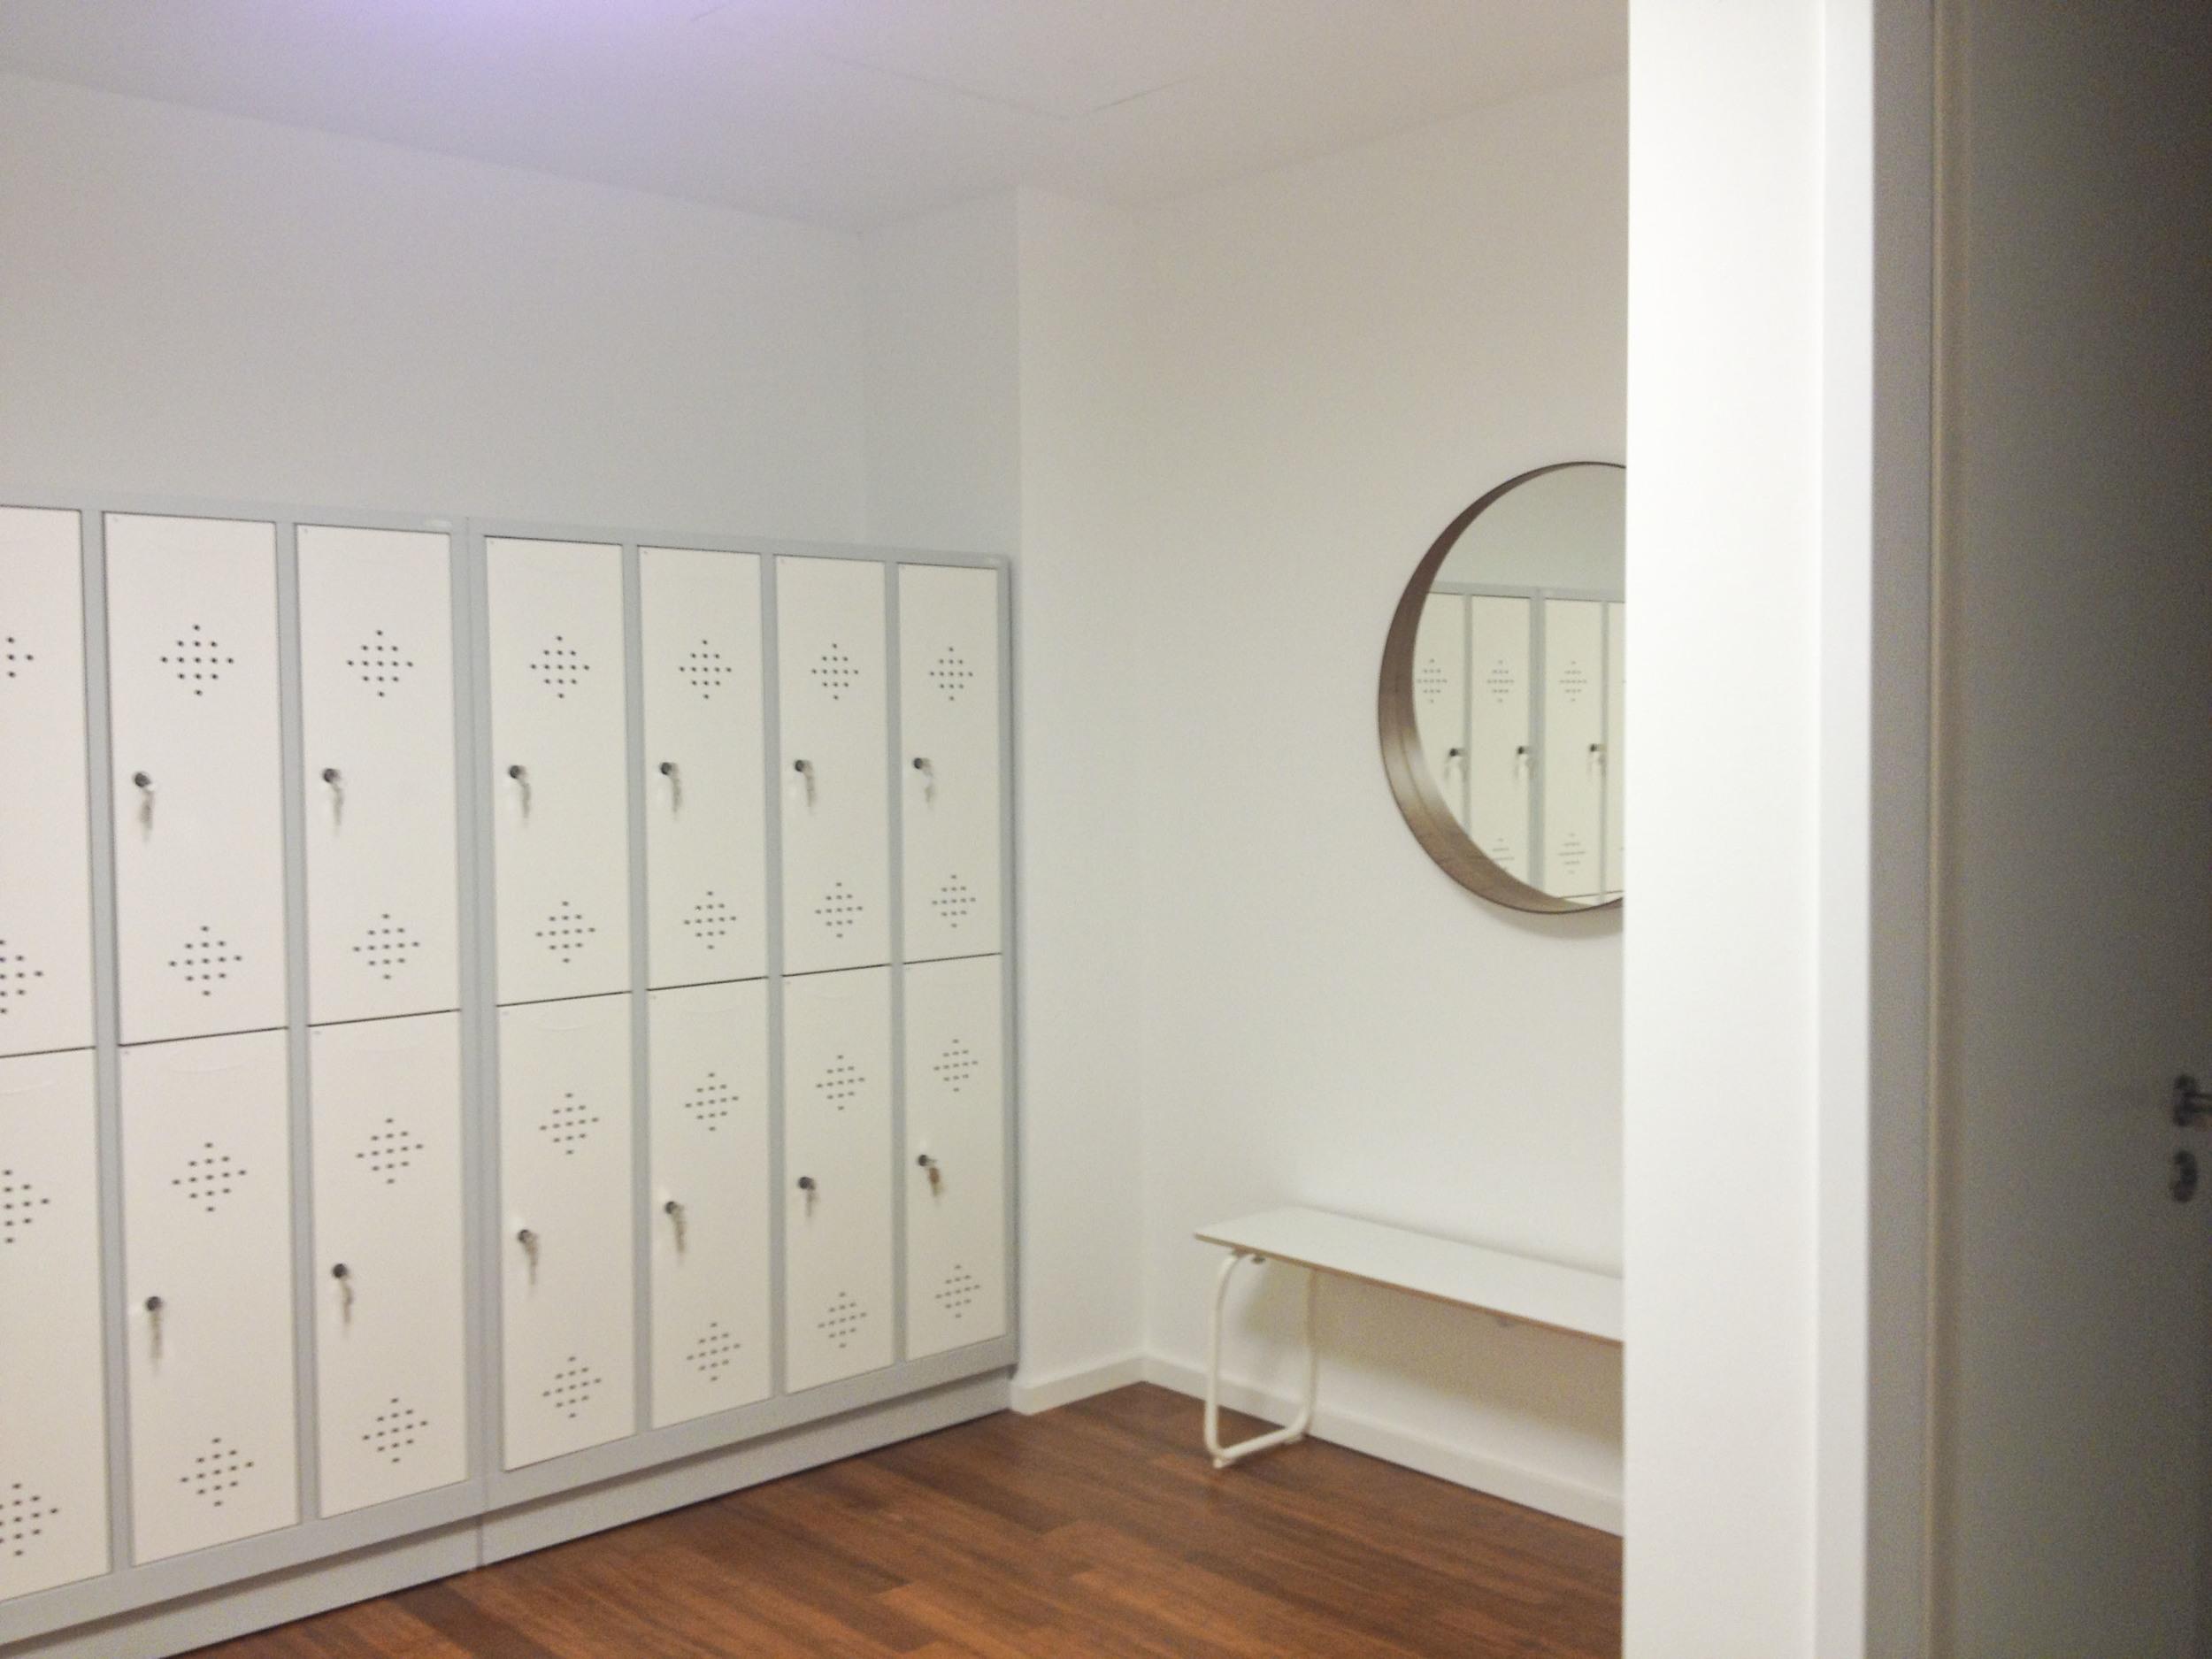 Patrick Broom Yoga, Yoga Studio, München 2176.jpg